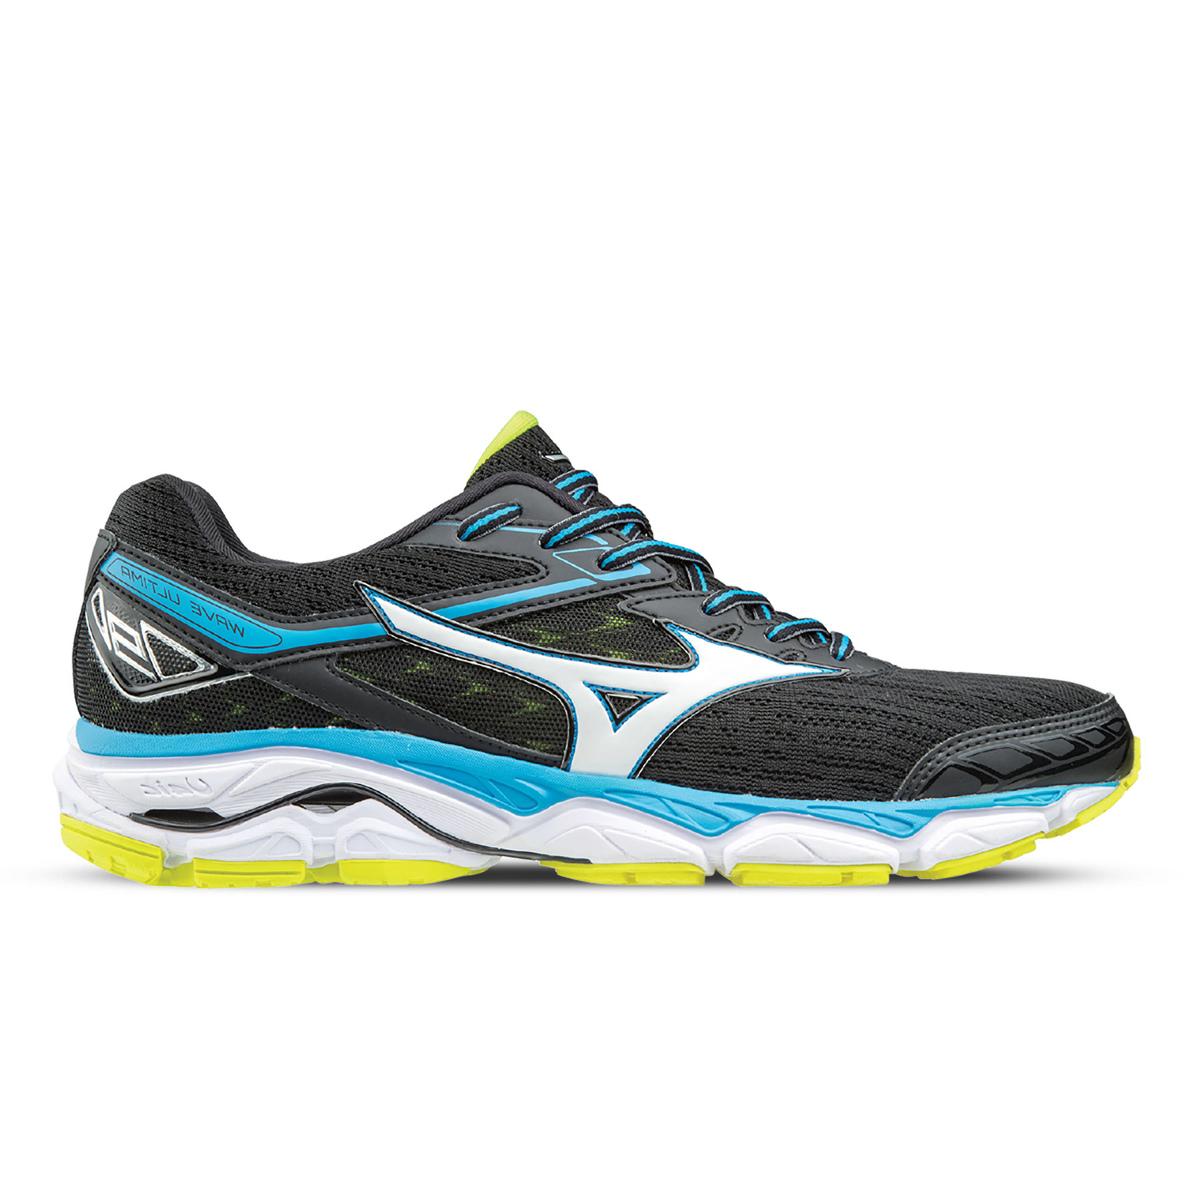 buy online 1465a 03963 Wave Runnea Opinioni Scarpe Running 9 Ultima Mizuno gdRtqYY